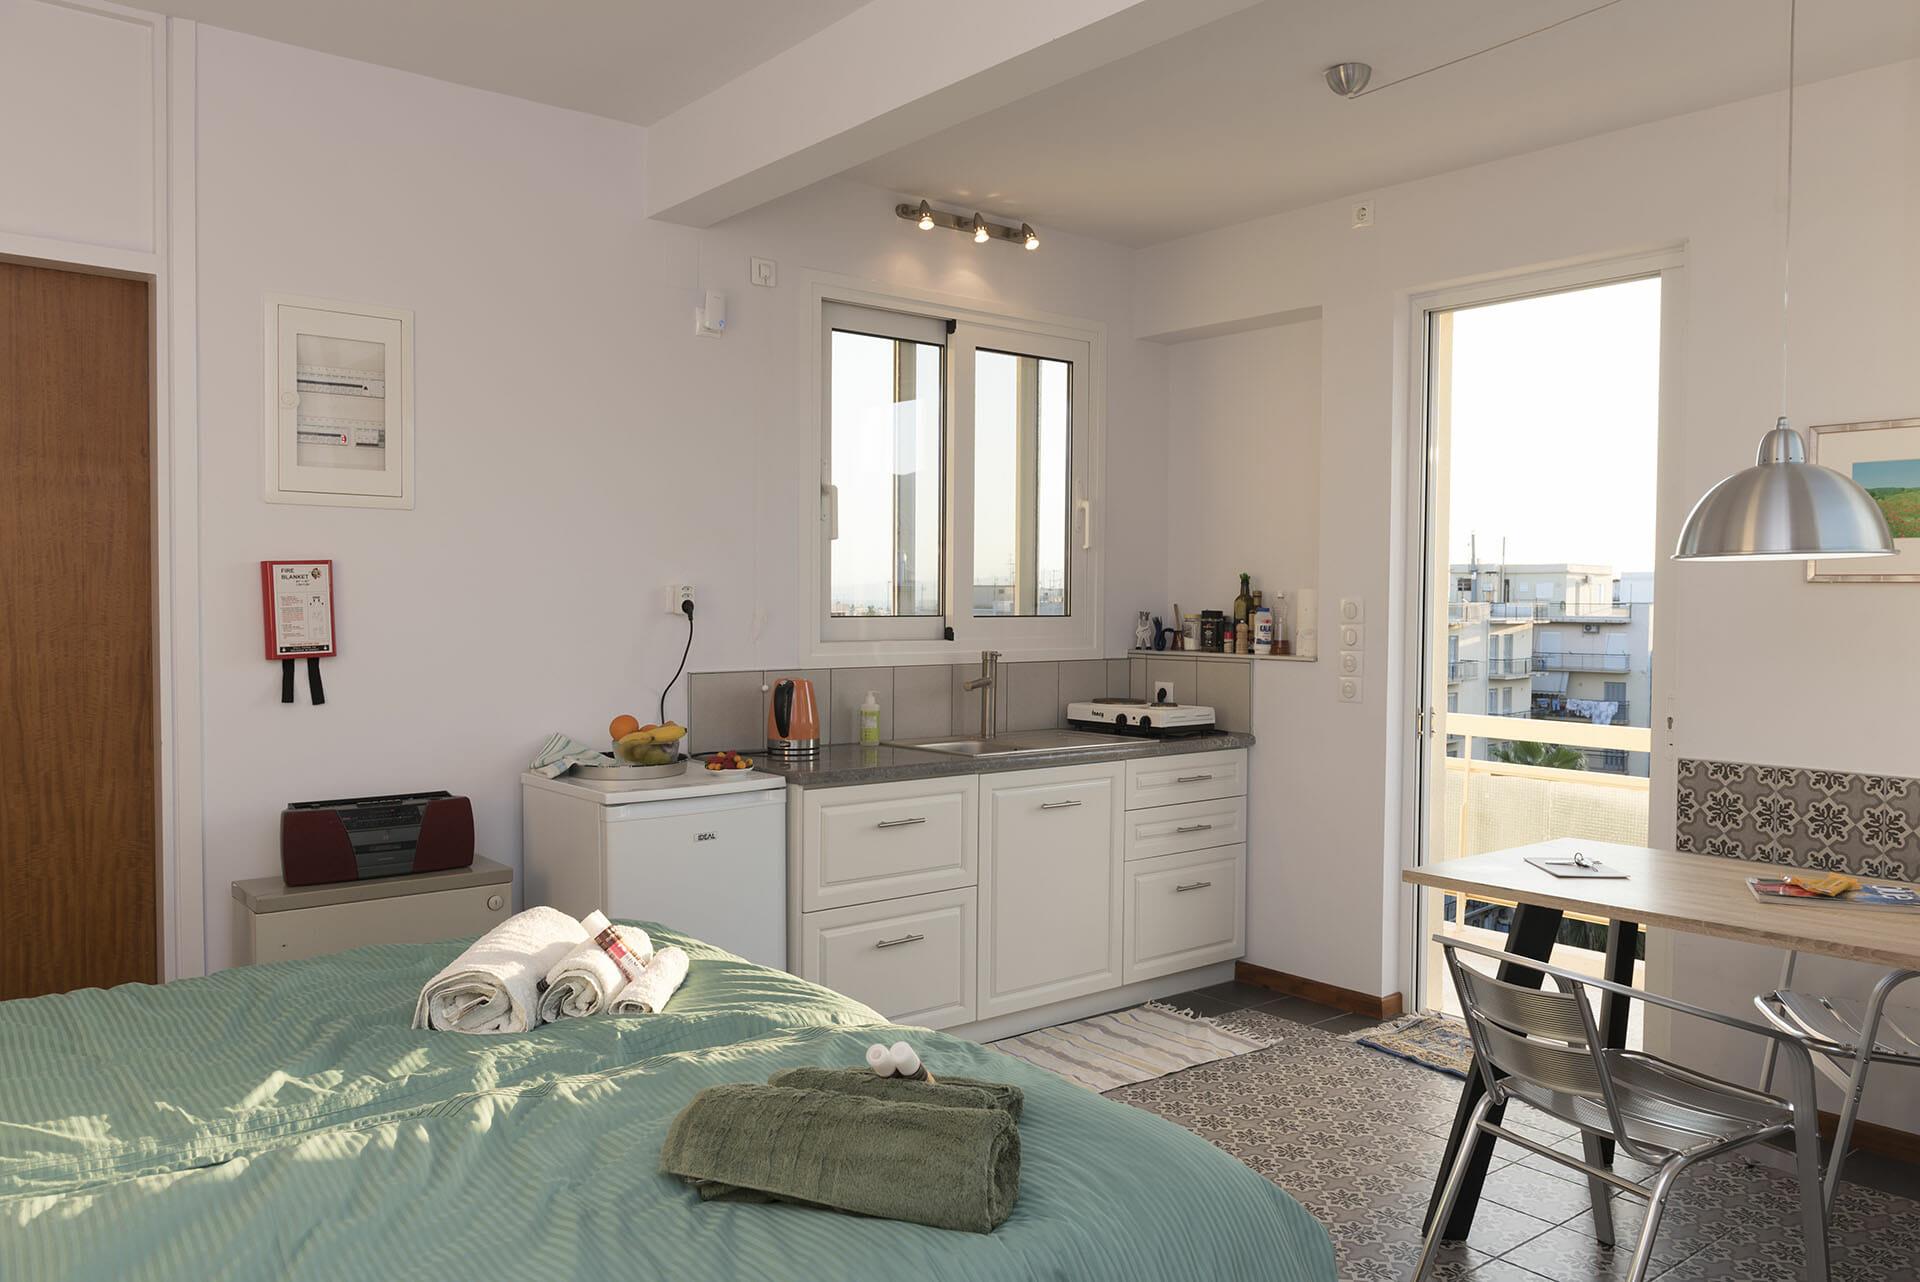 Kalamata Top Rooms - Apartments rent - Accommodation - City Penthouse ENA